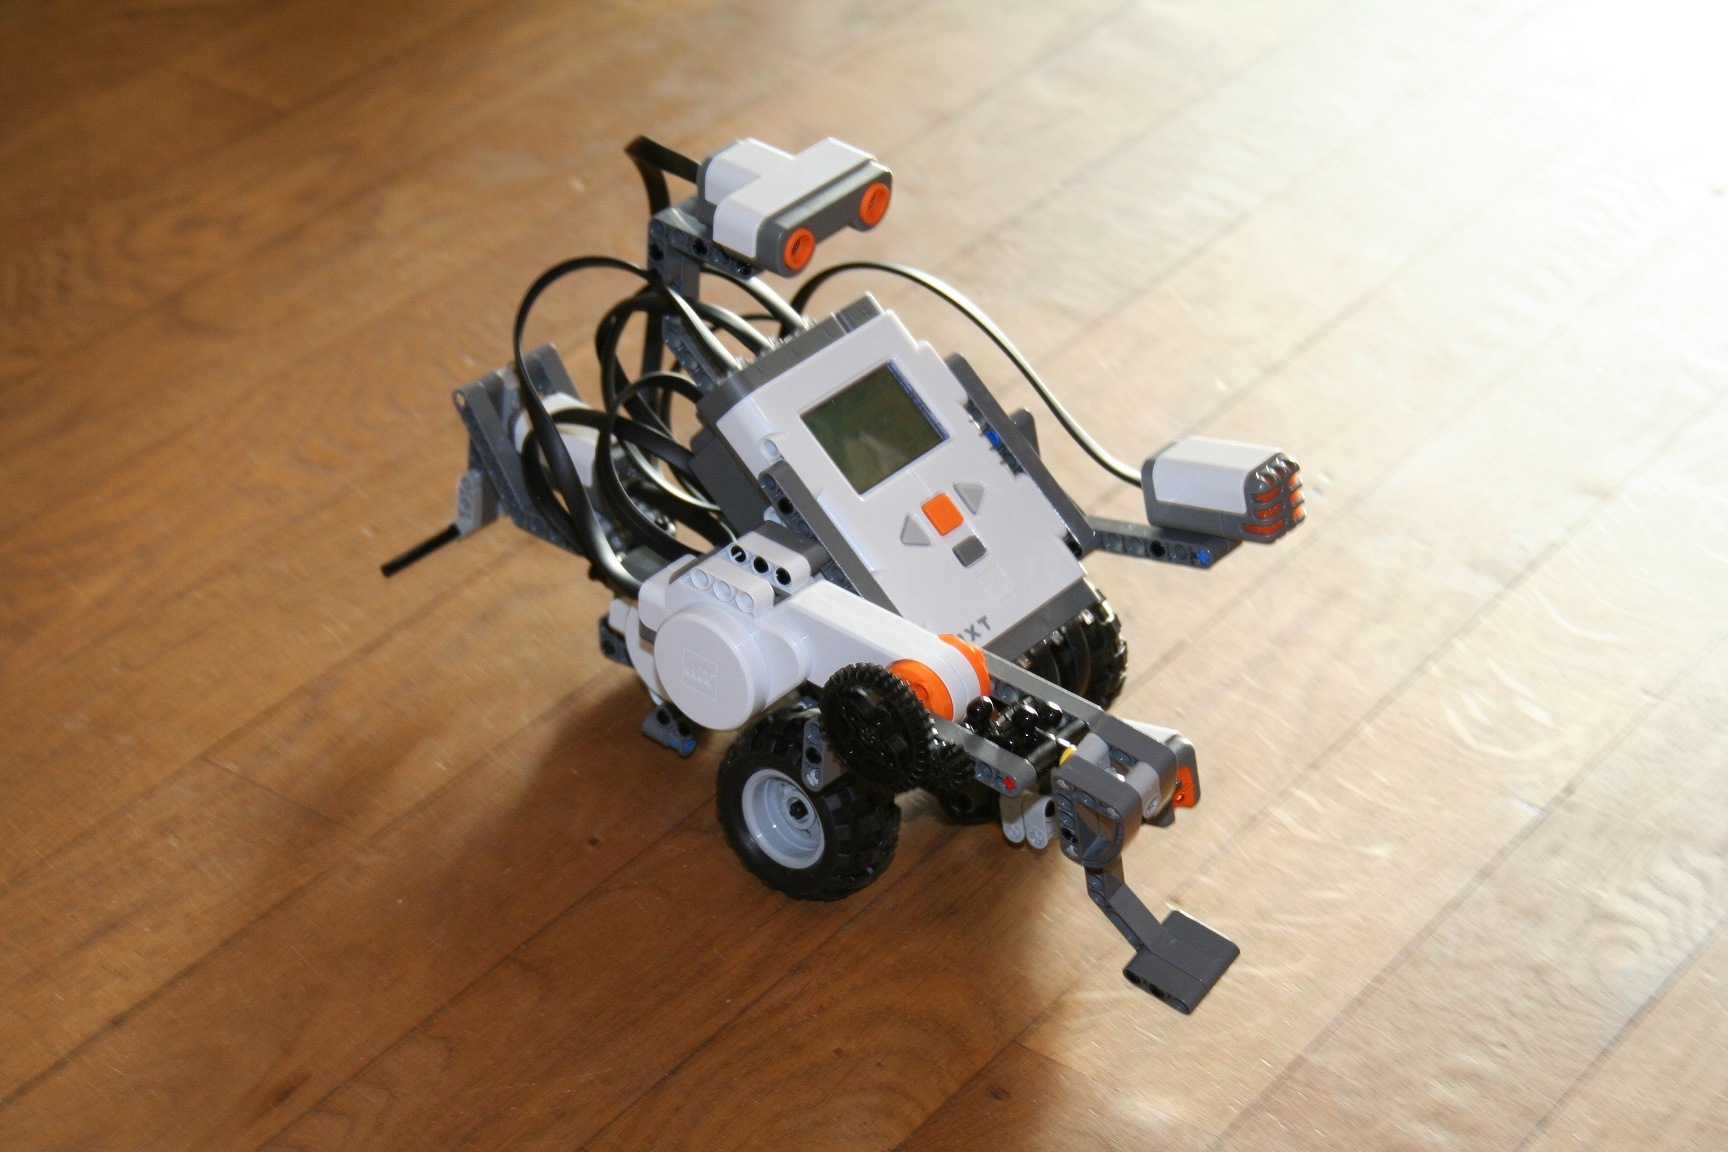 Lego_Mindstorms_Nxt-FLL1